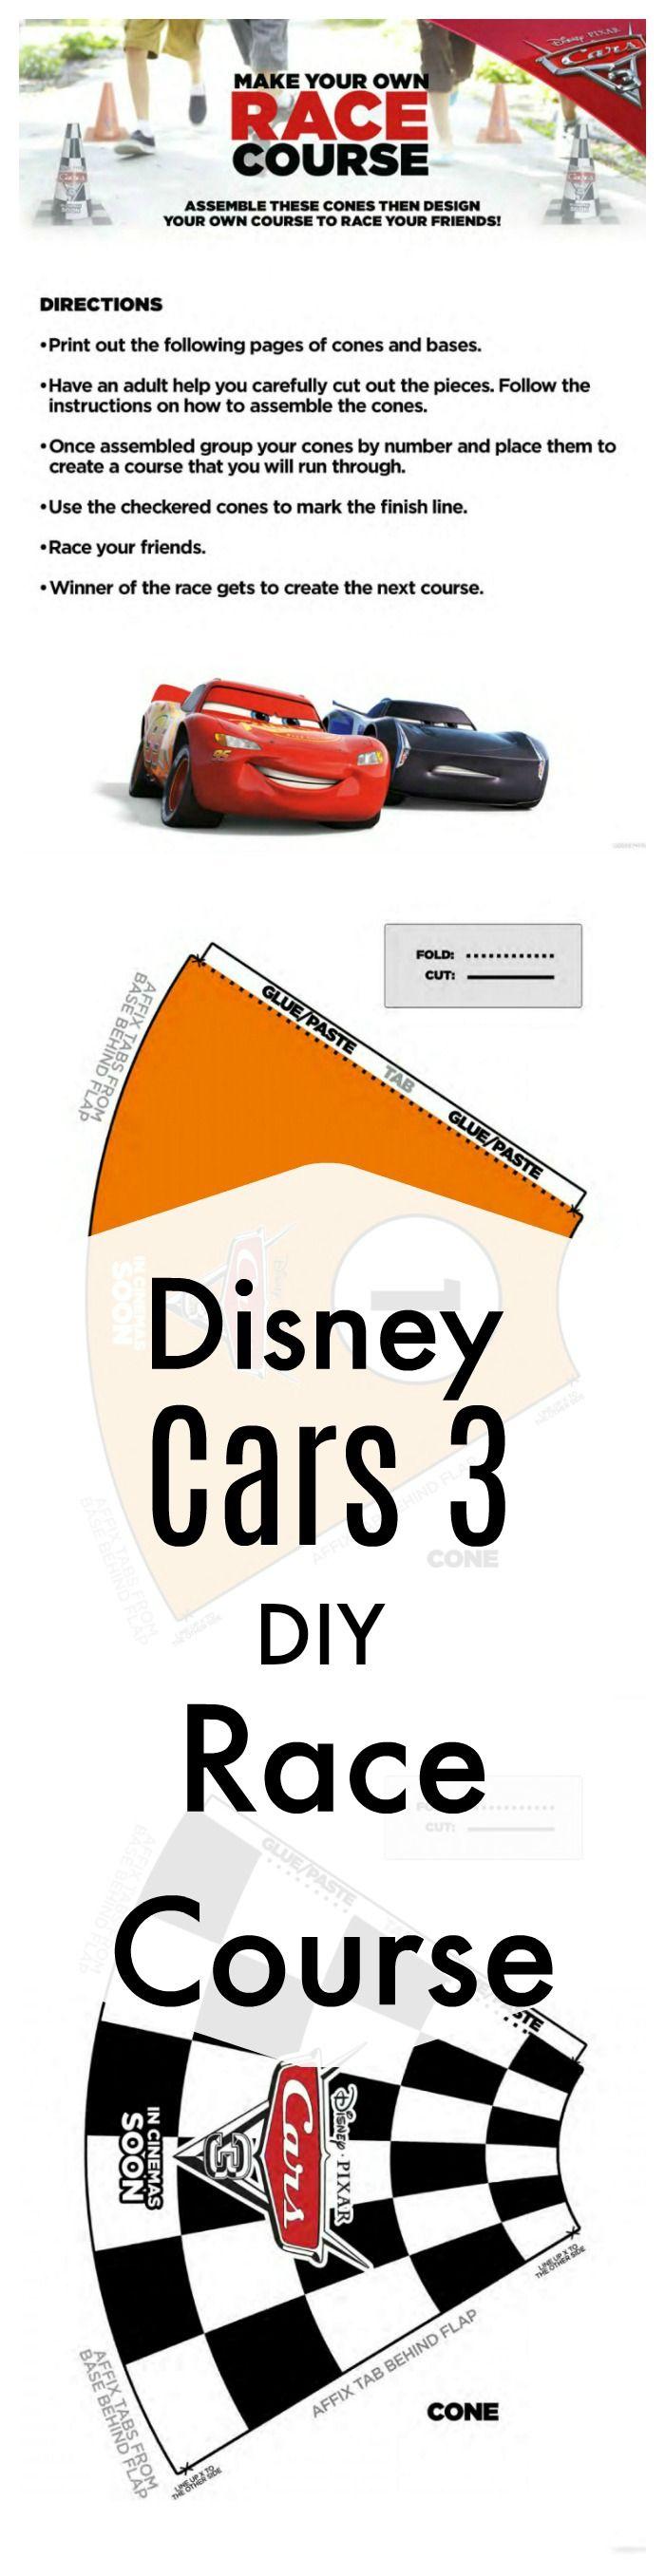 Disney Cars 3 Printable DIY Race Course Game | Printable Coloring ...